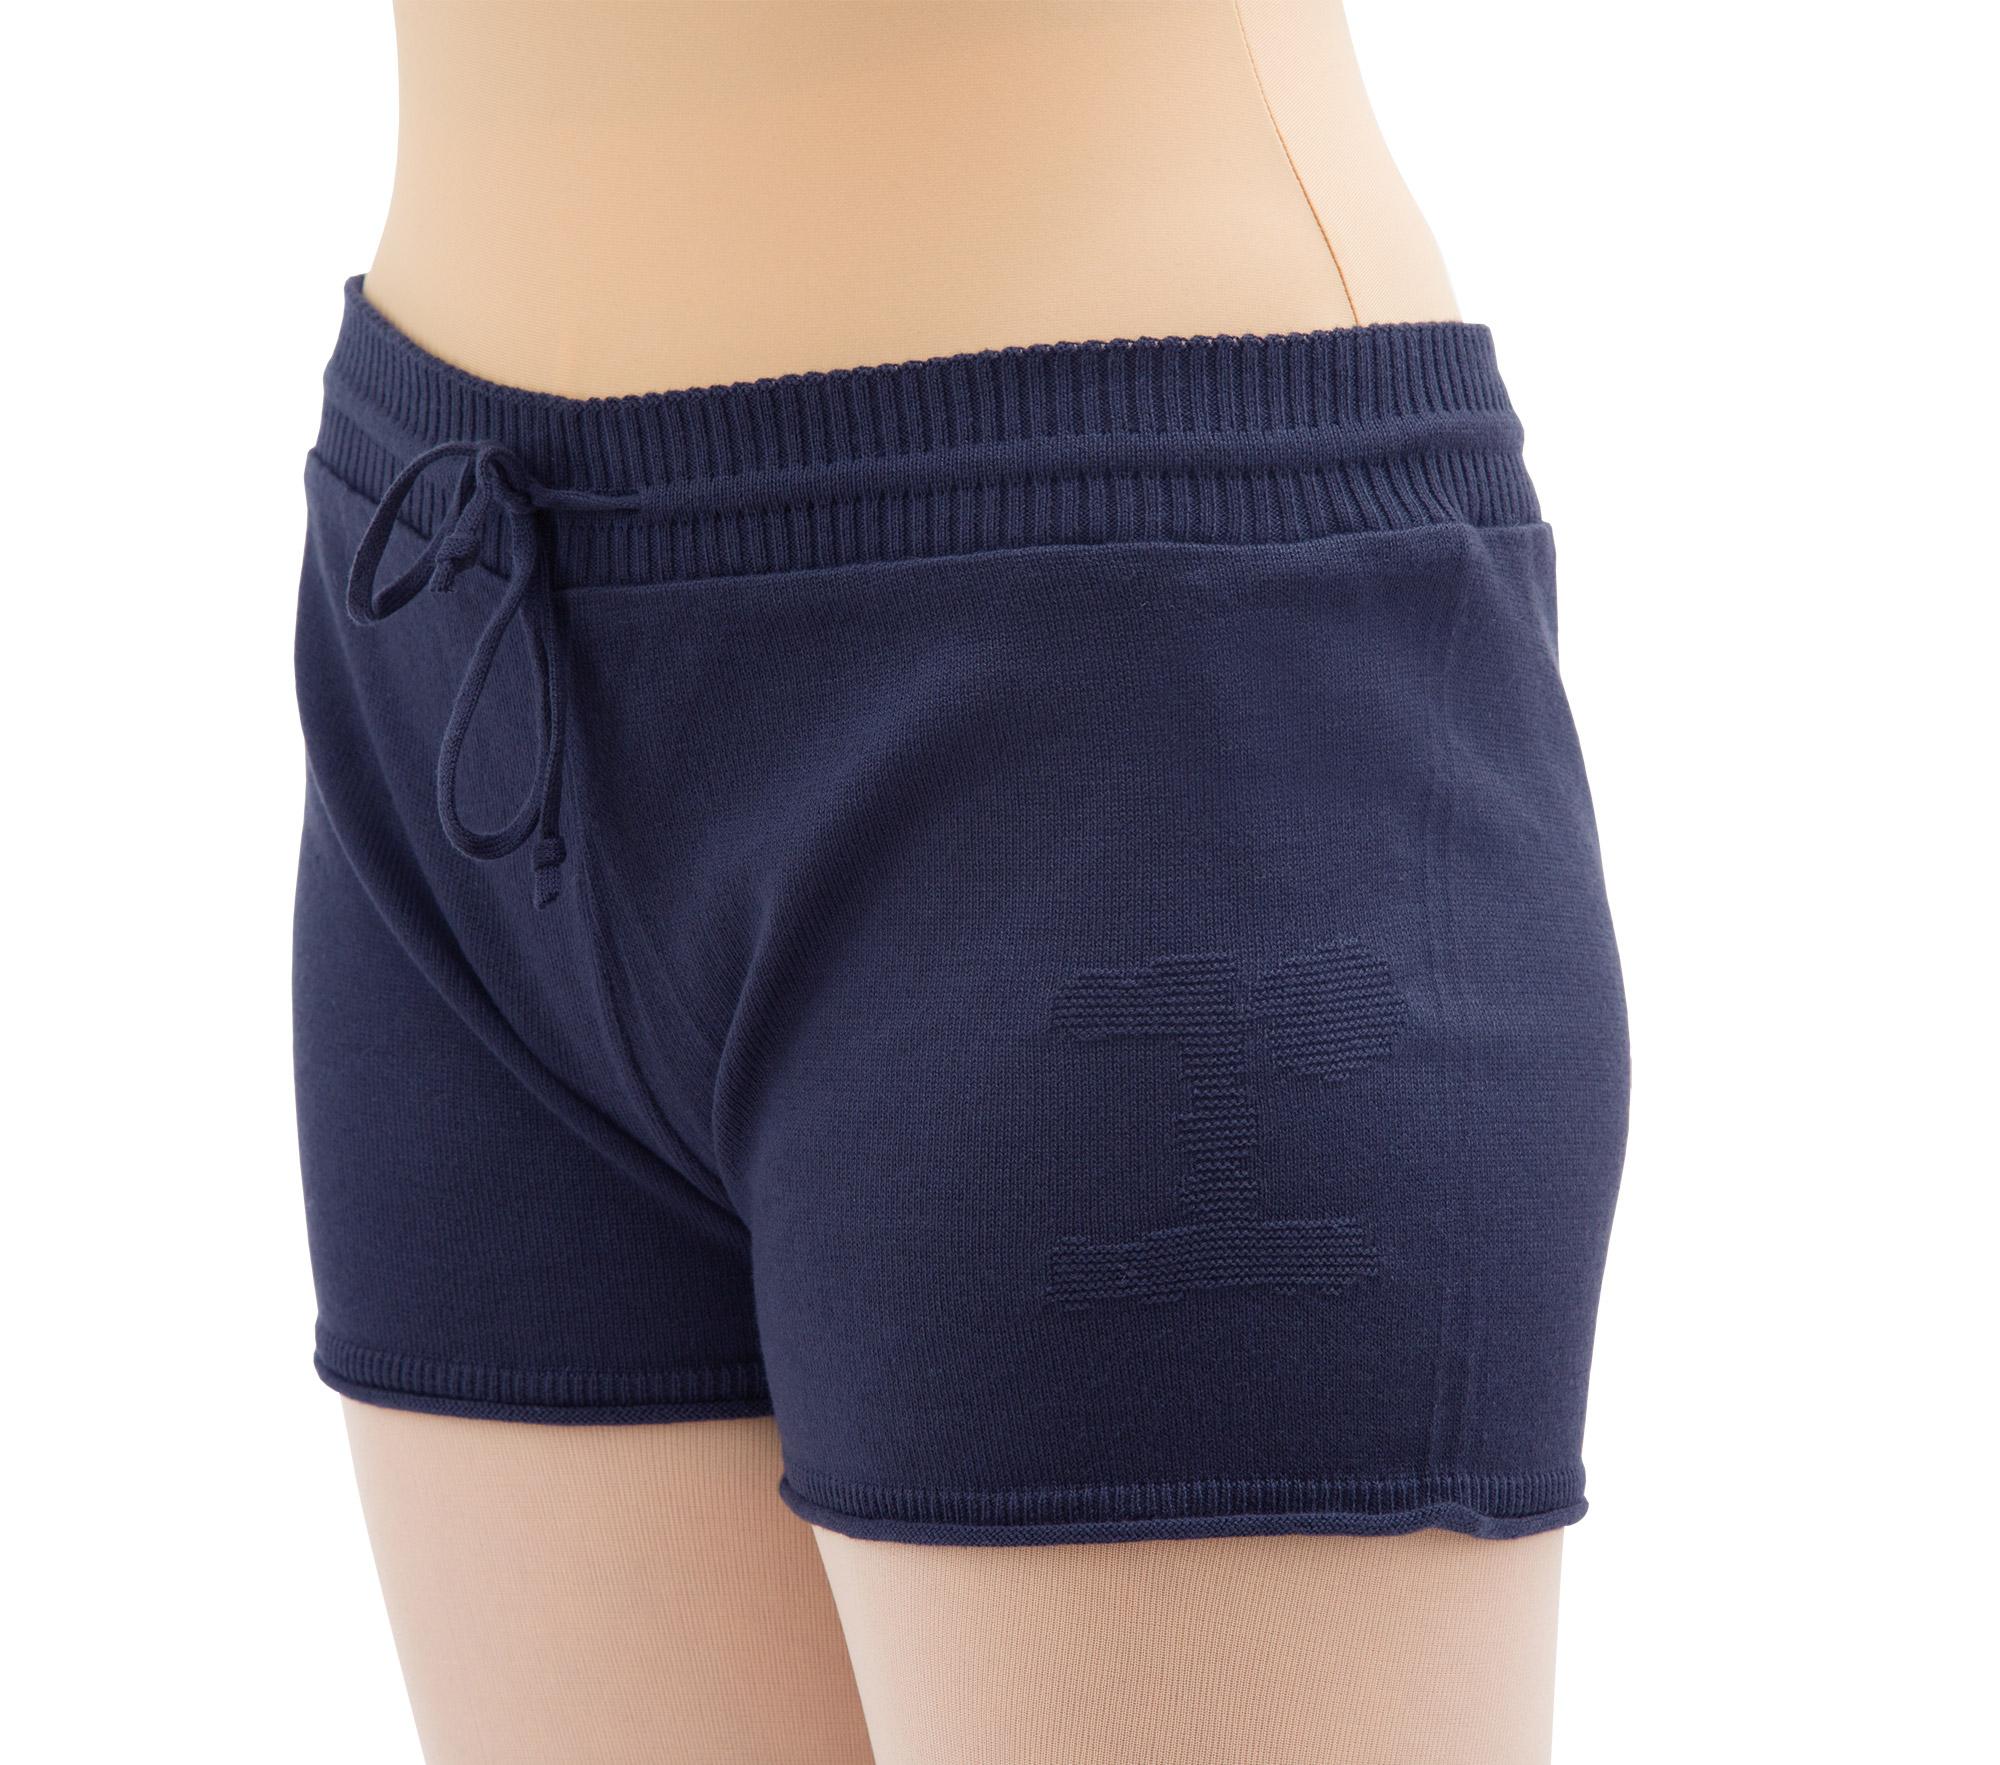 Warm-up shorts